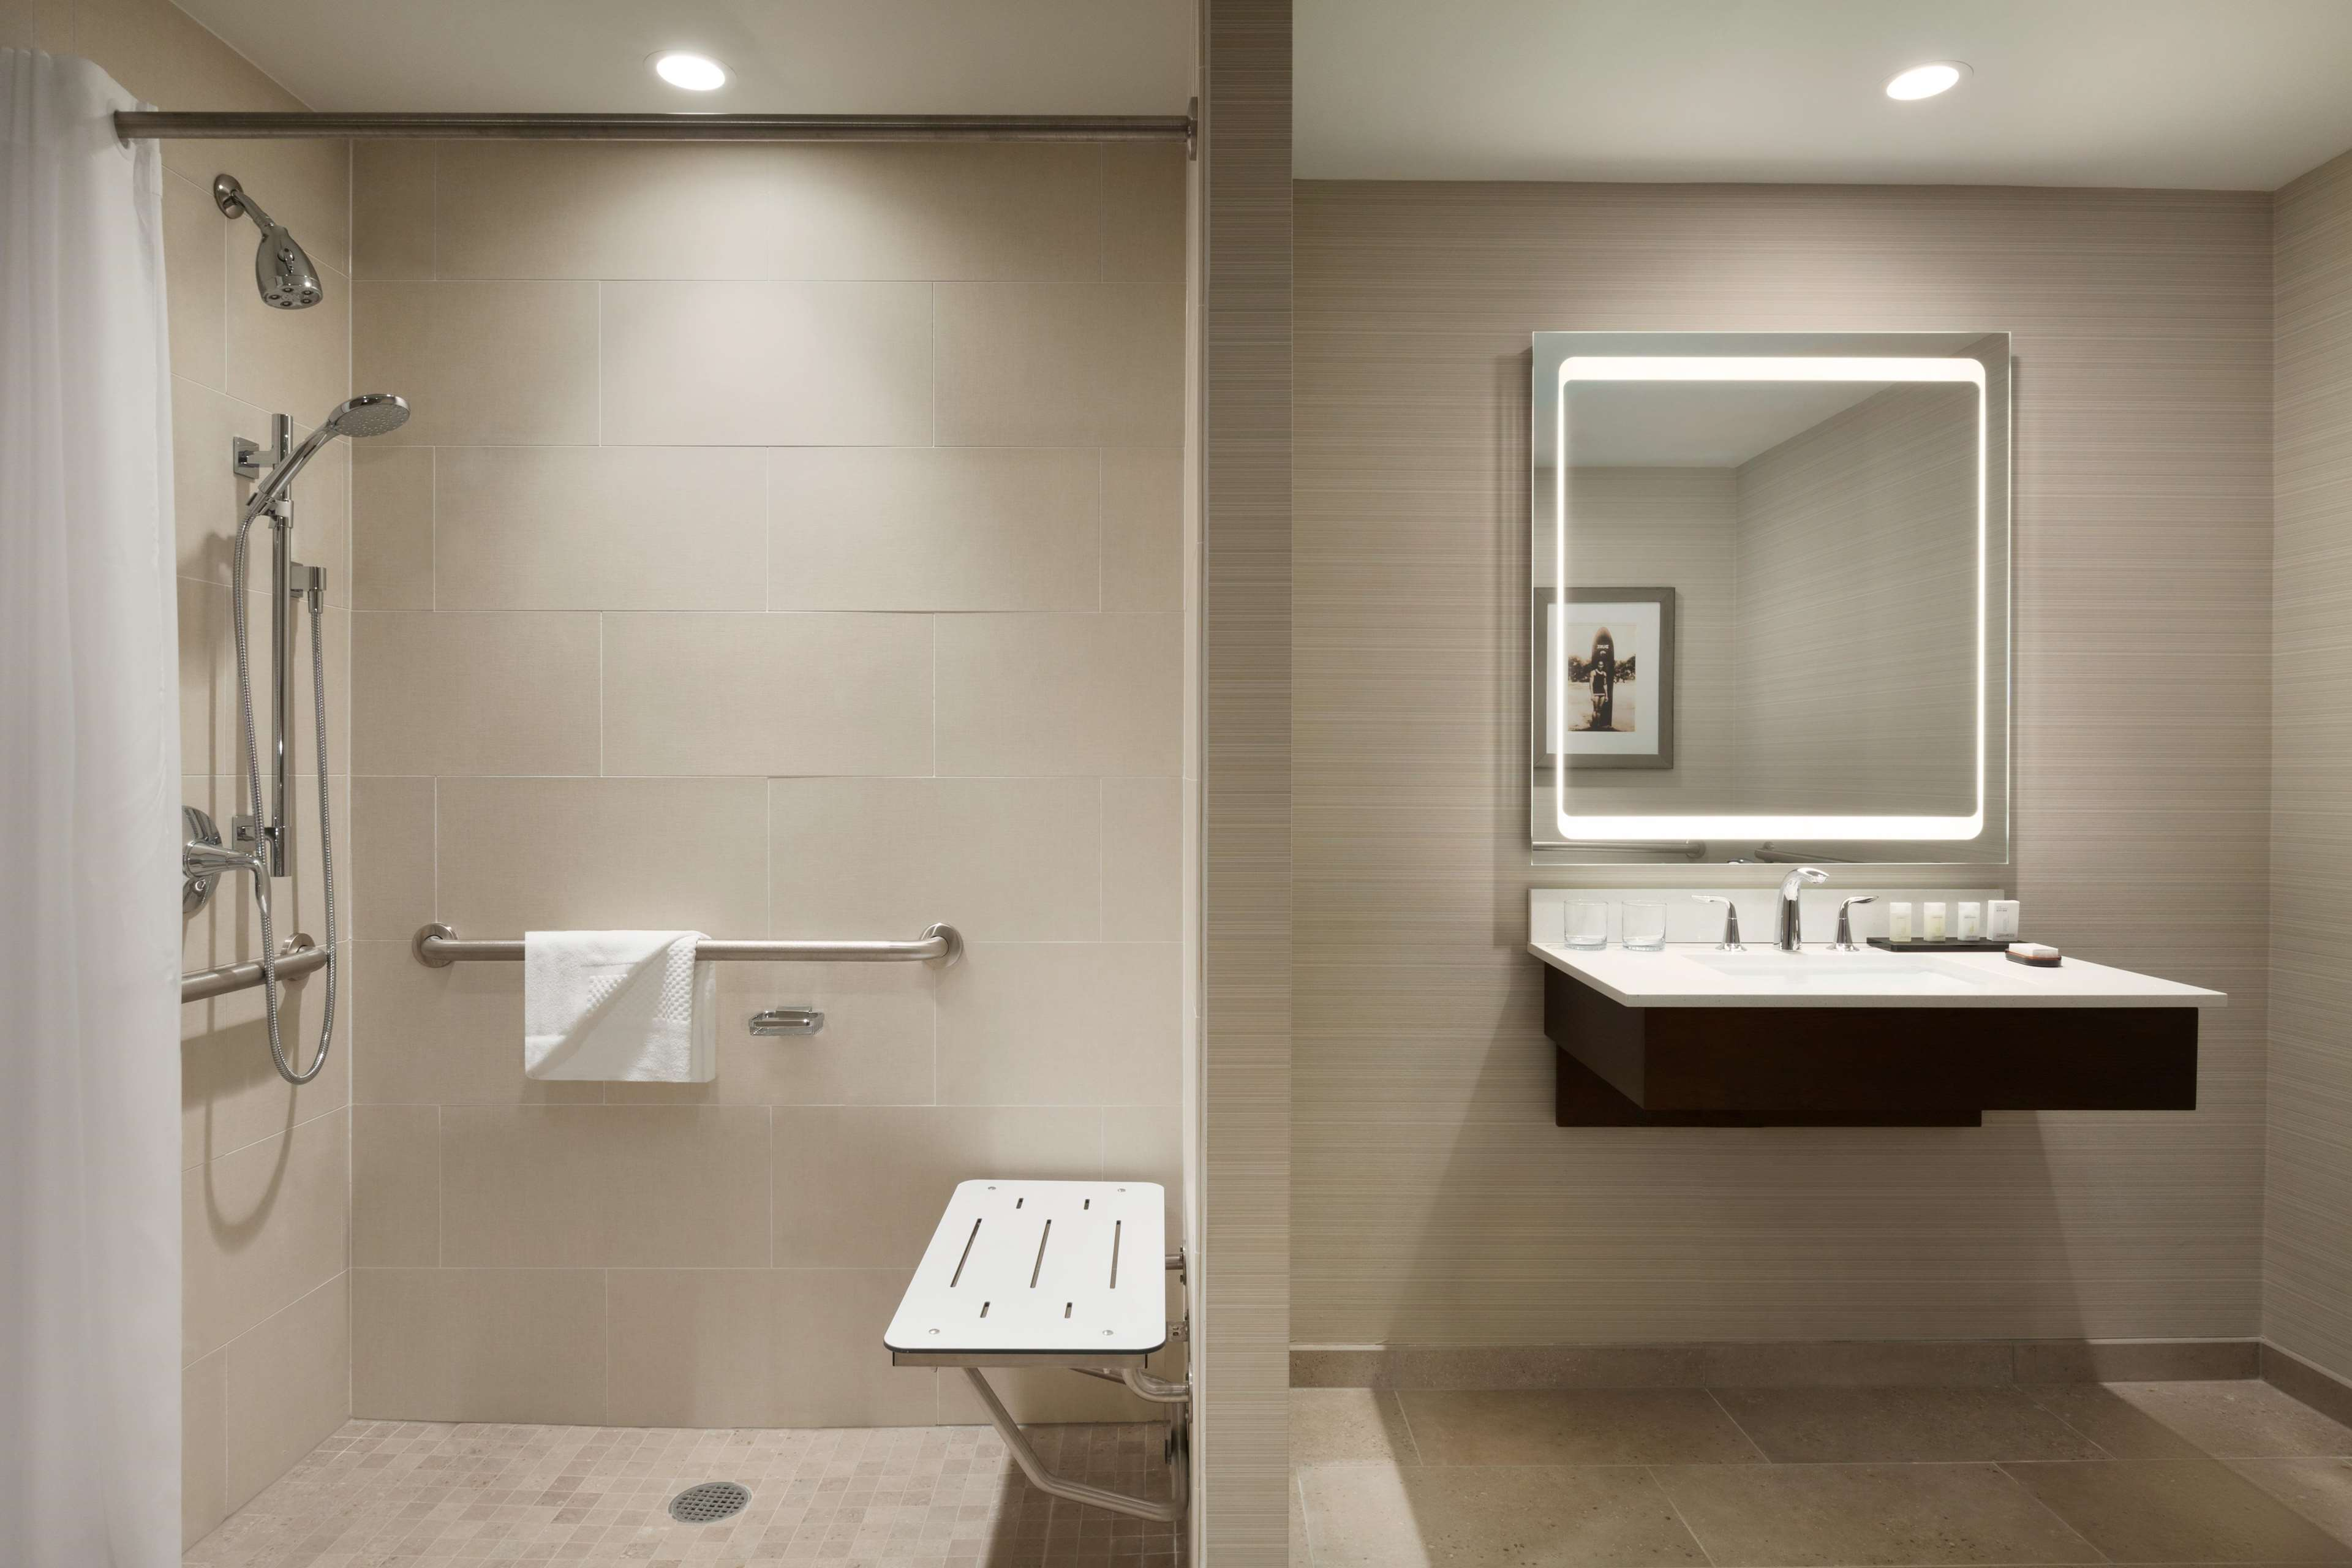 Embassy Suites by Hilton Oahu Kapolei image 34